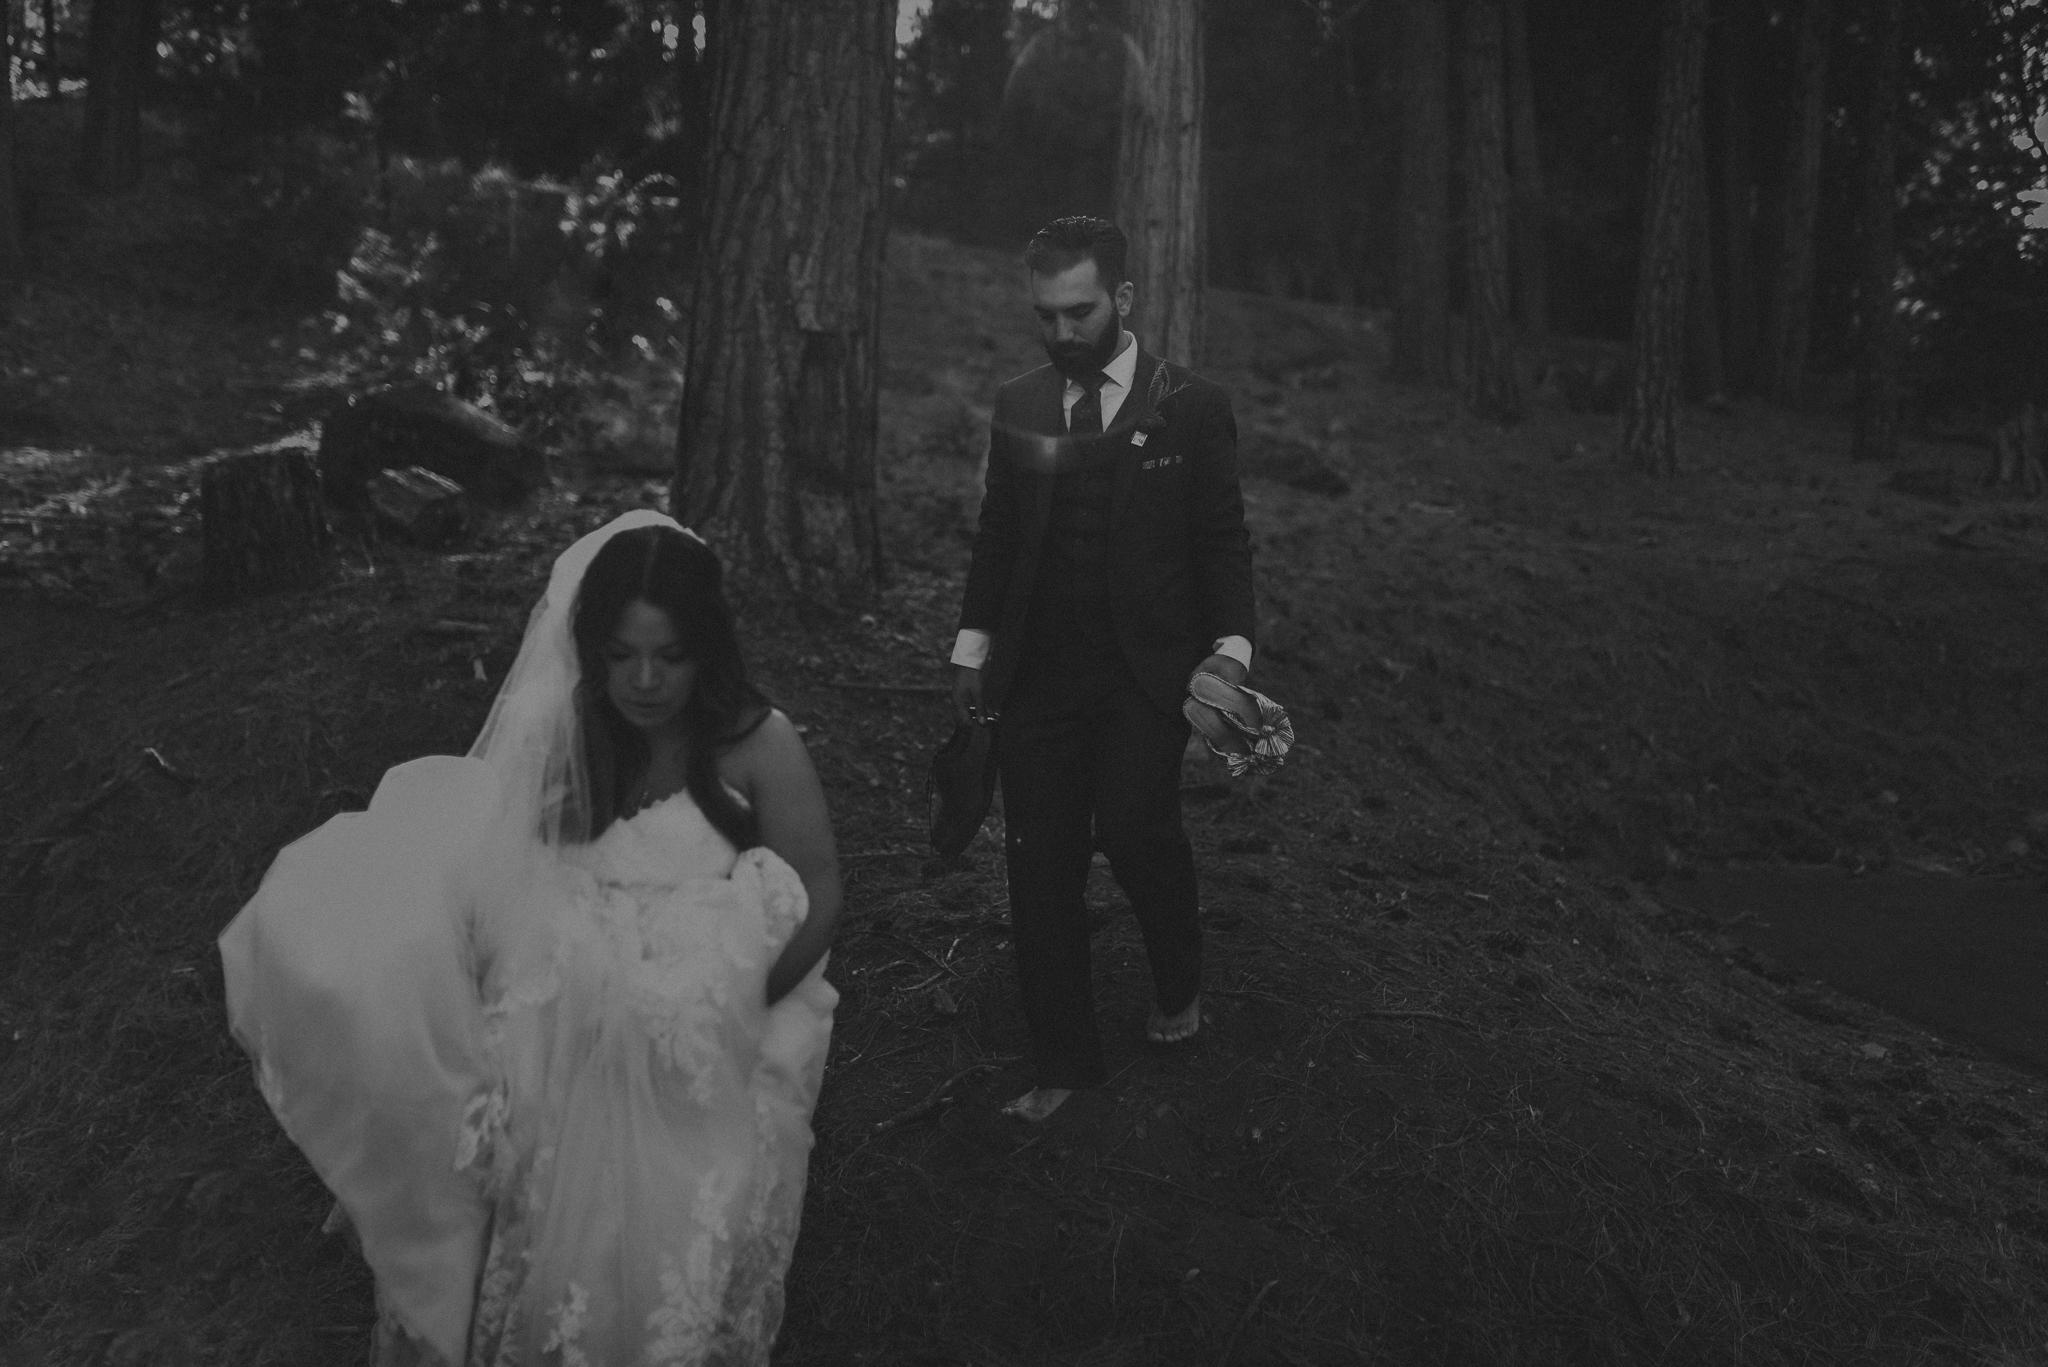 Yosemite Elopement Photographer - Evergreen Lodge Wedding Photographer - IsaiahAndTaylor.com-115.jpg